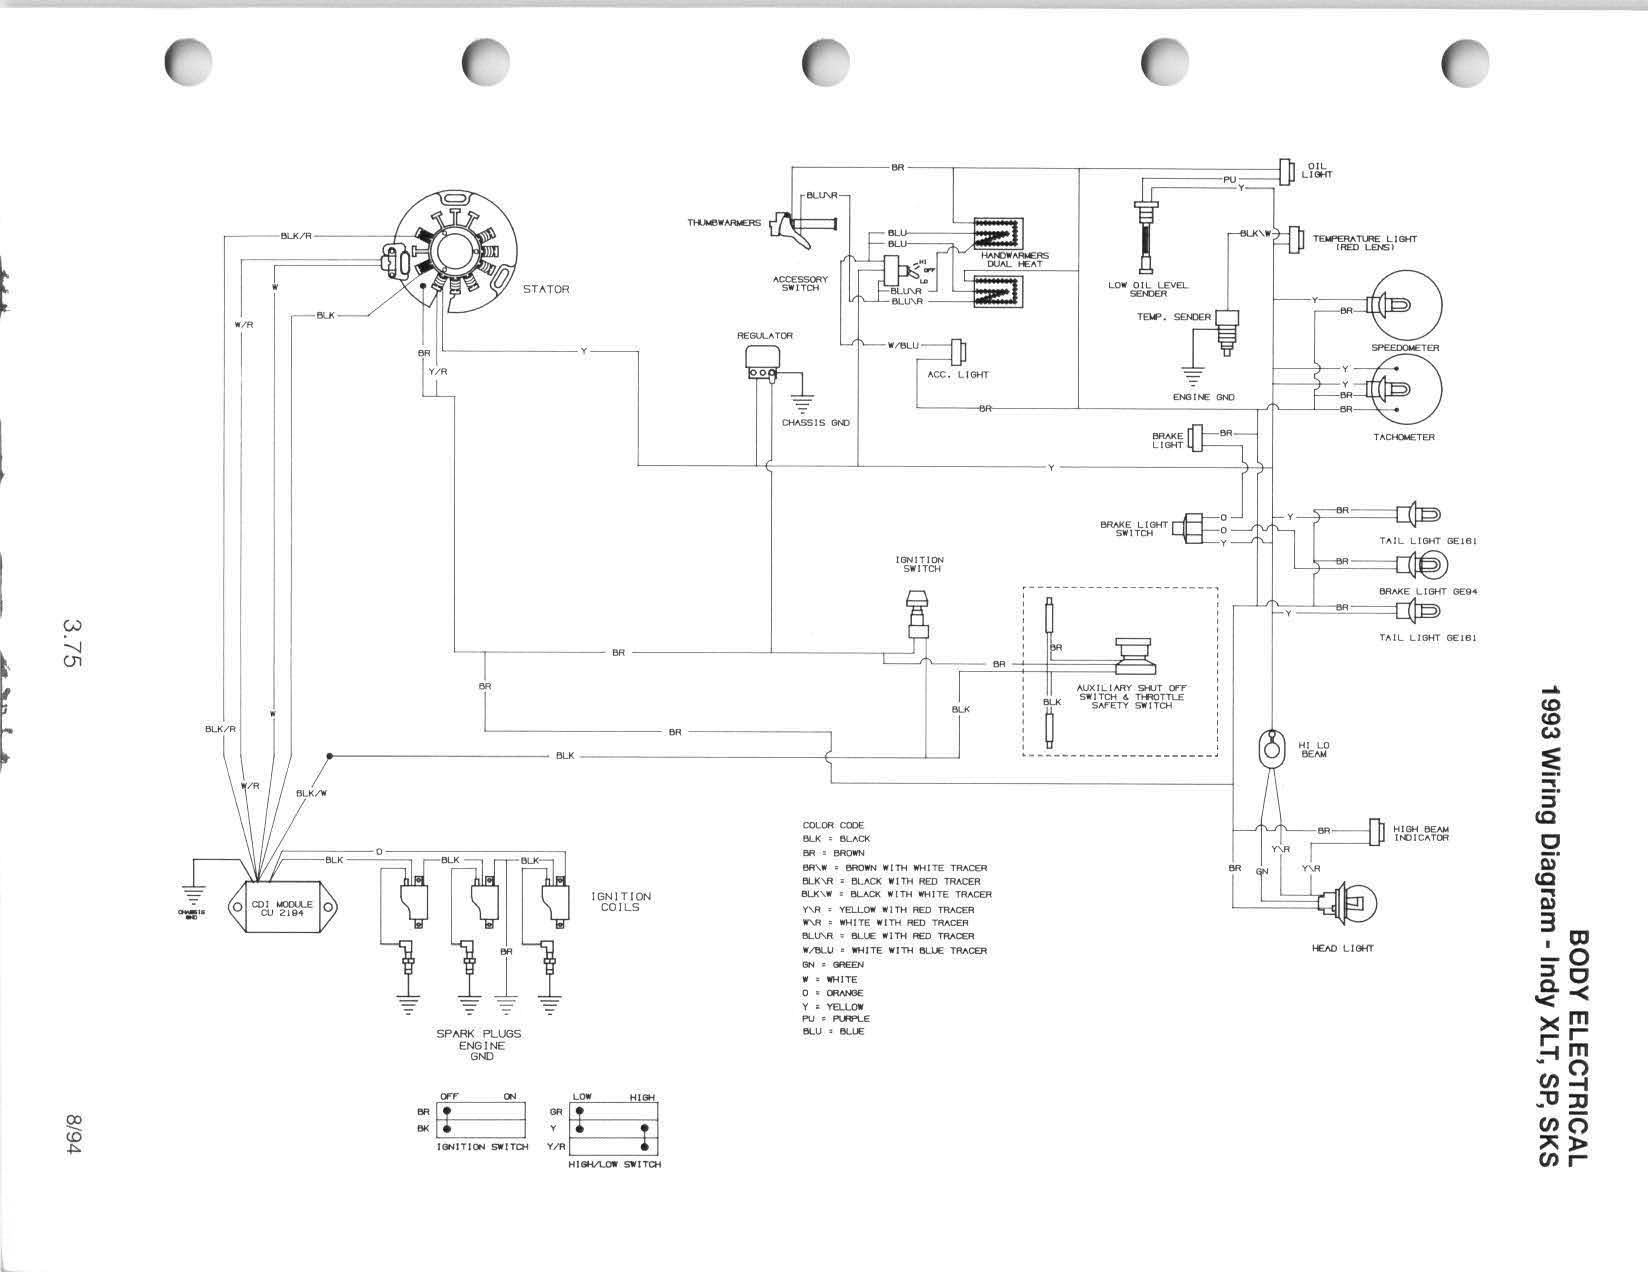 Wiring Diagram Arctic Cat Snowmobile